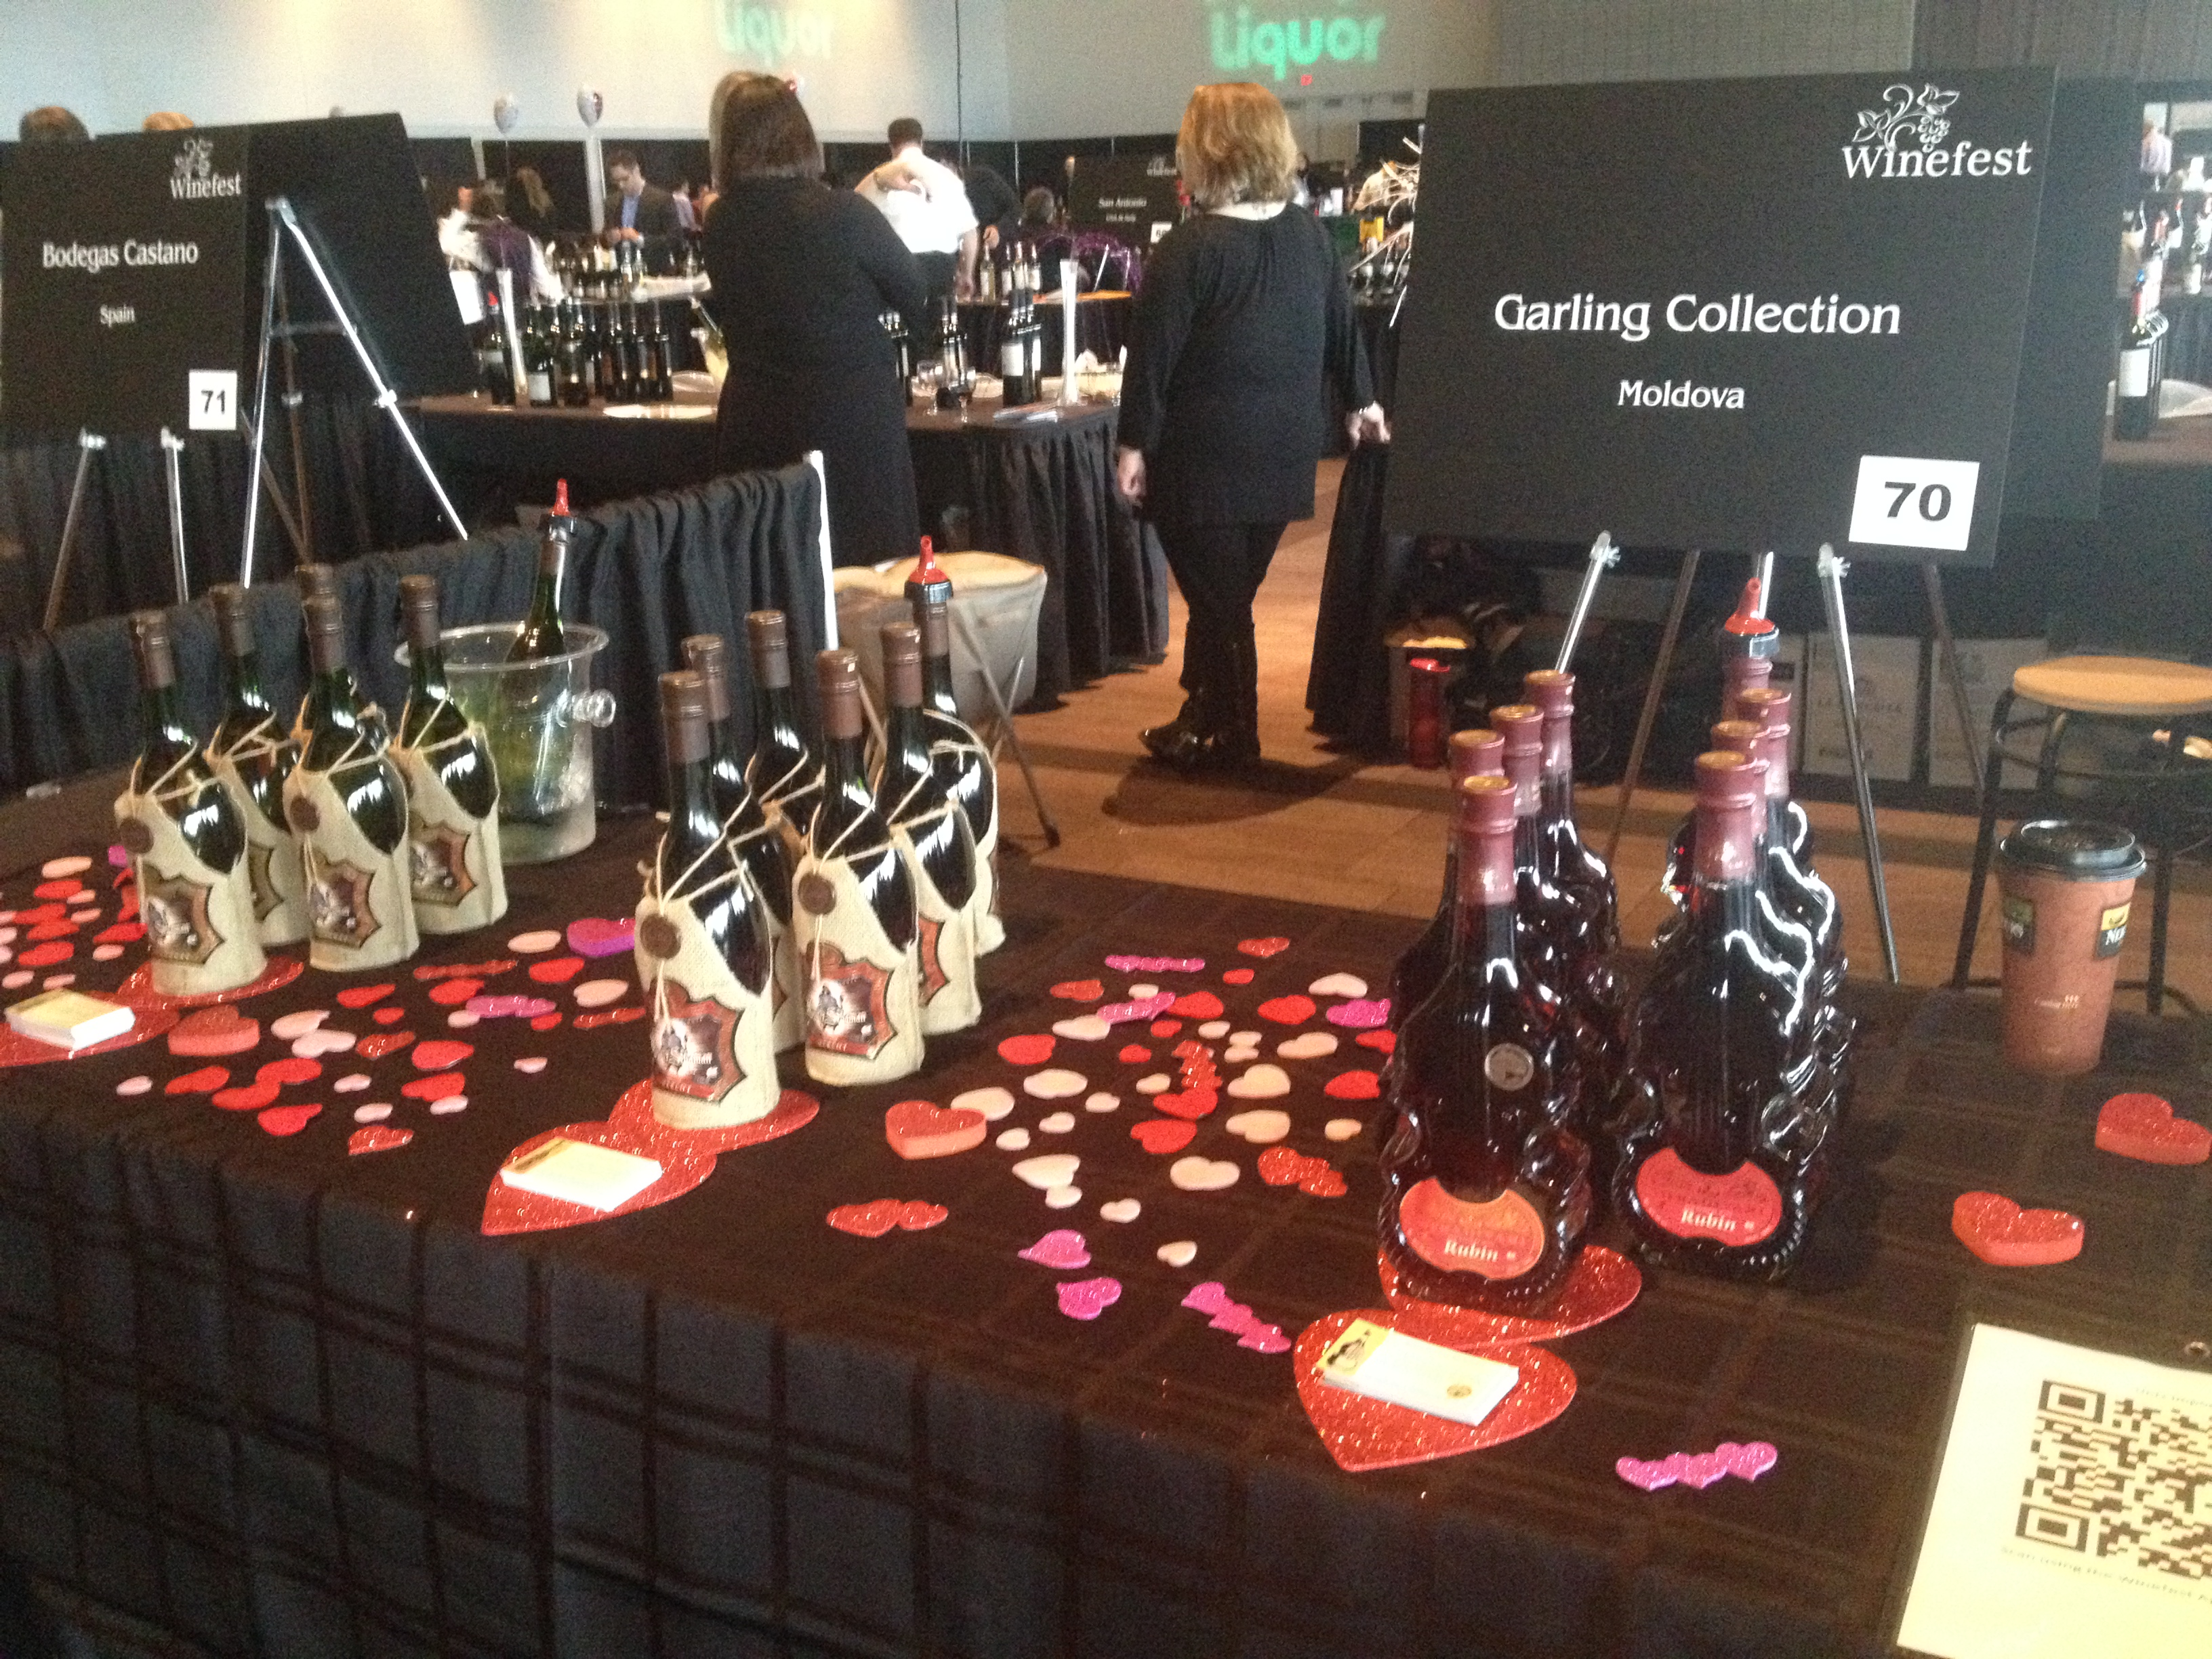 Winefest Edmonton Feb 14-15 2014